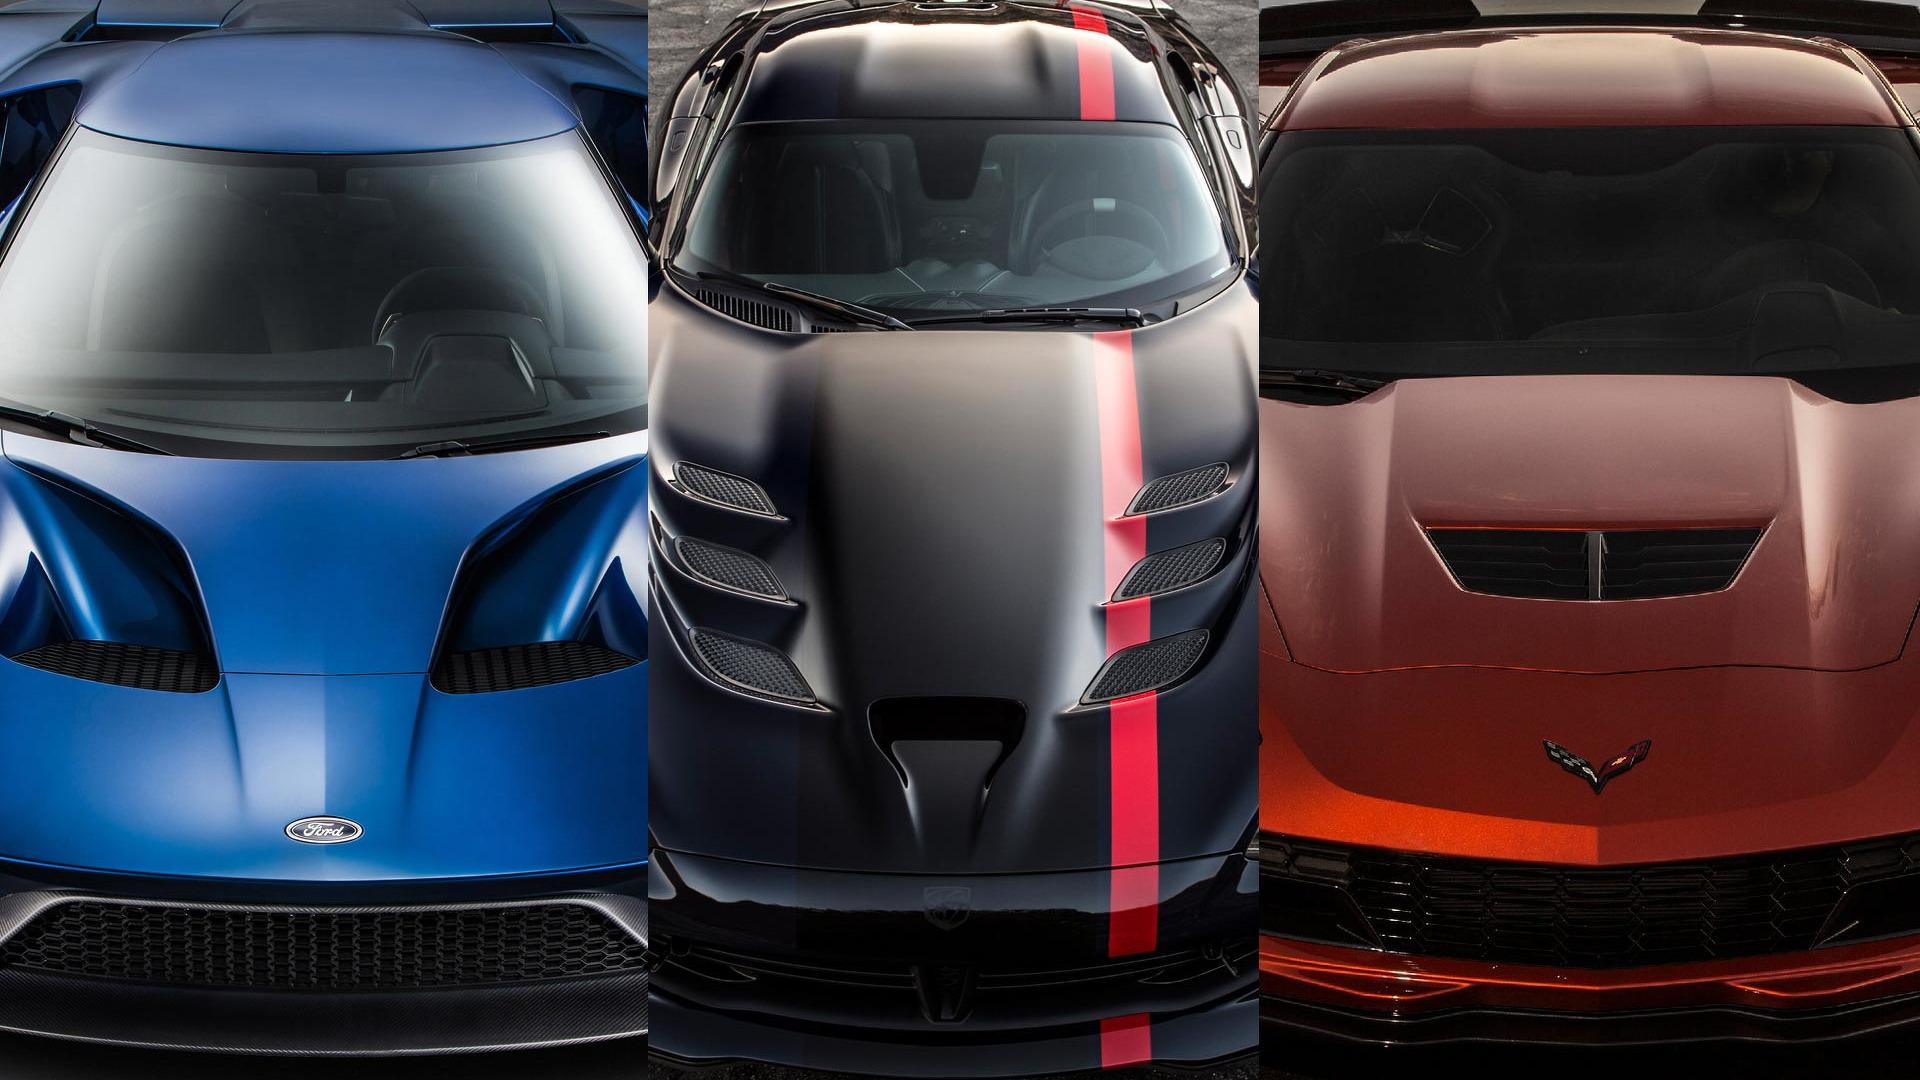 Board gt products 01 gt - Civil War Ford Gt Vs Chevy Corvette Z06 Vs Dodge Viper Acr Product 2017 01 28 00 02 01